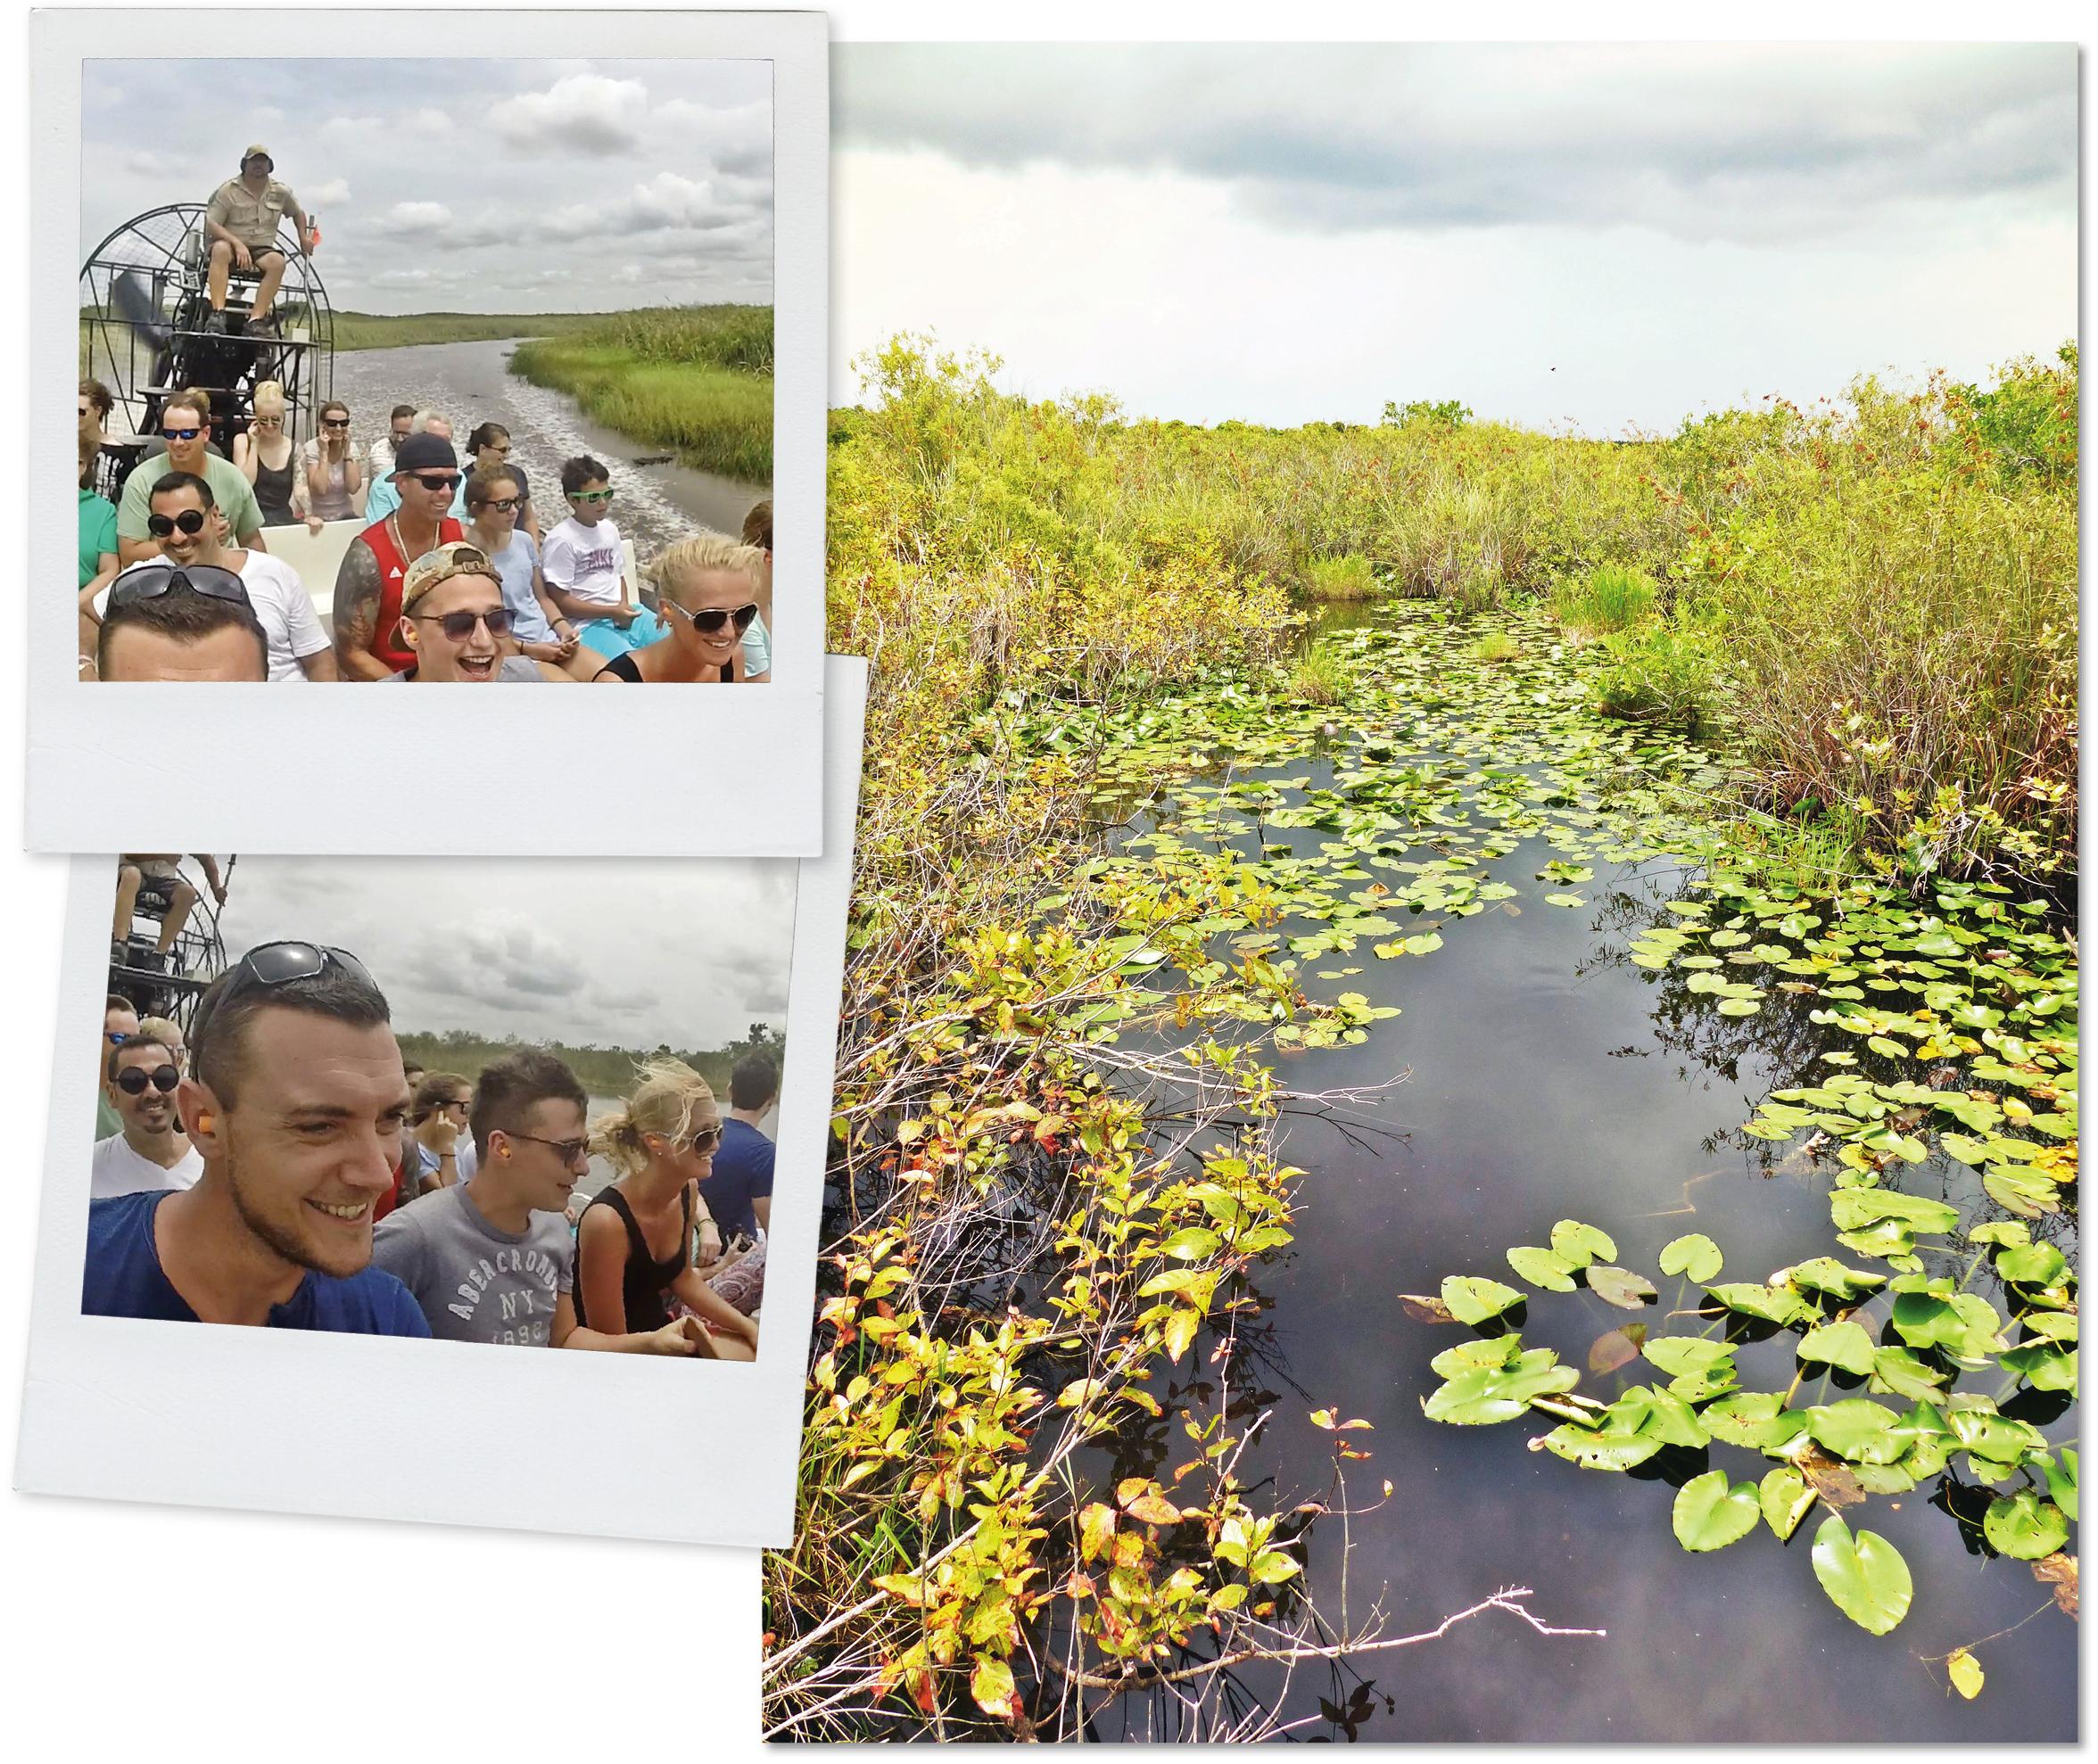 usa, voyage, Floride, Miami, everglades, crocodiles, crickets, serpents, sunshine state, road trip, hydroglisseur